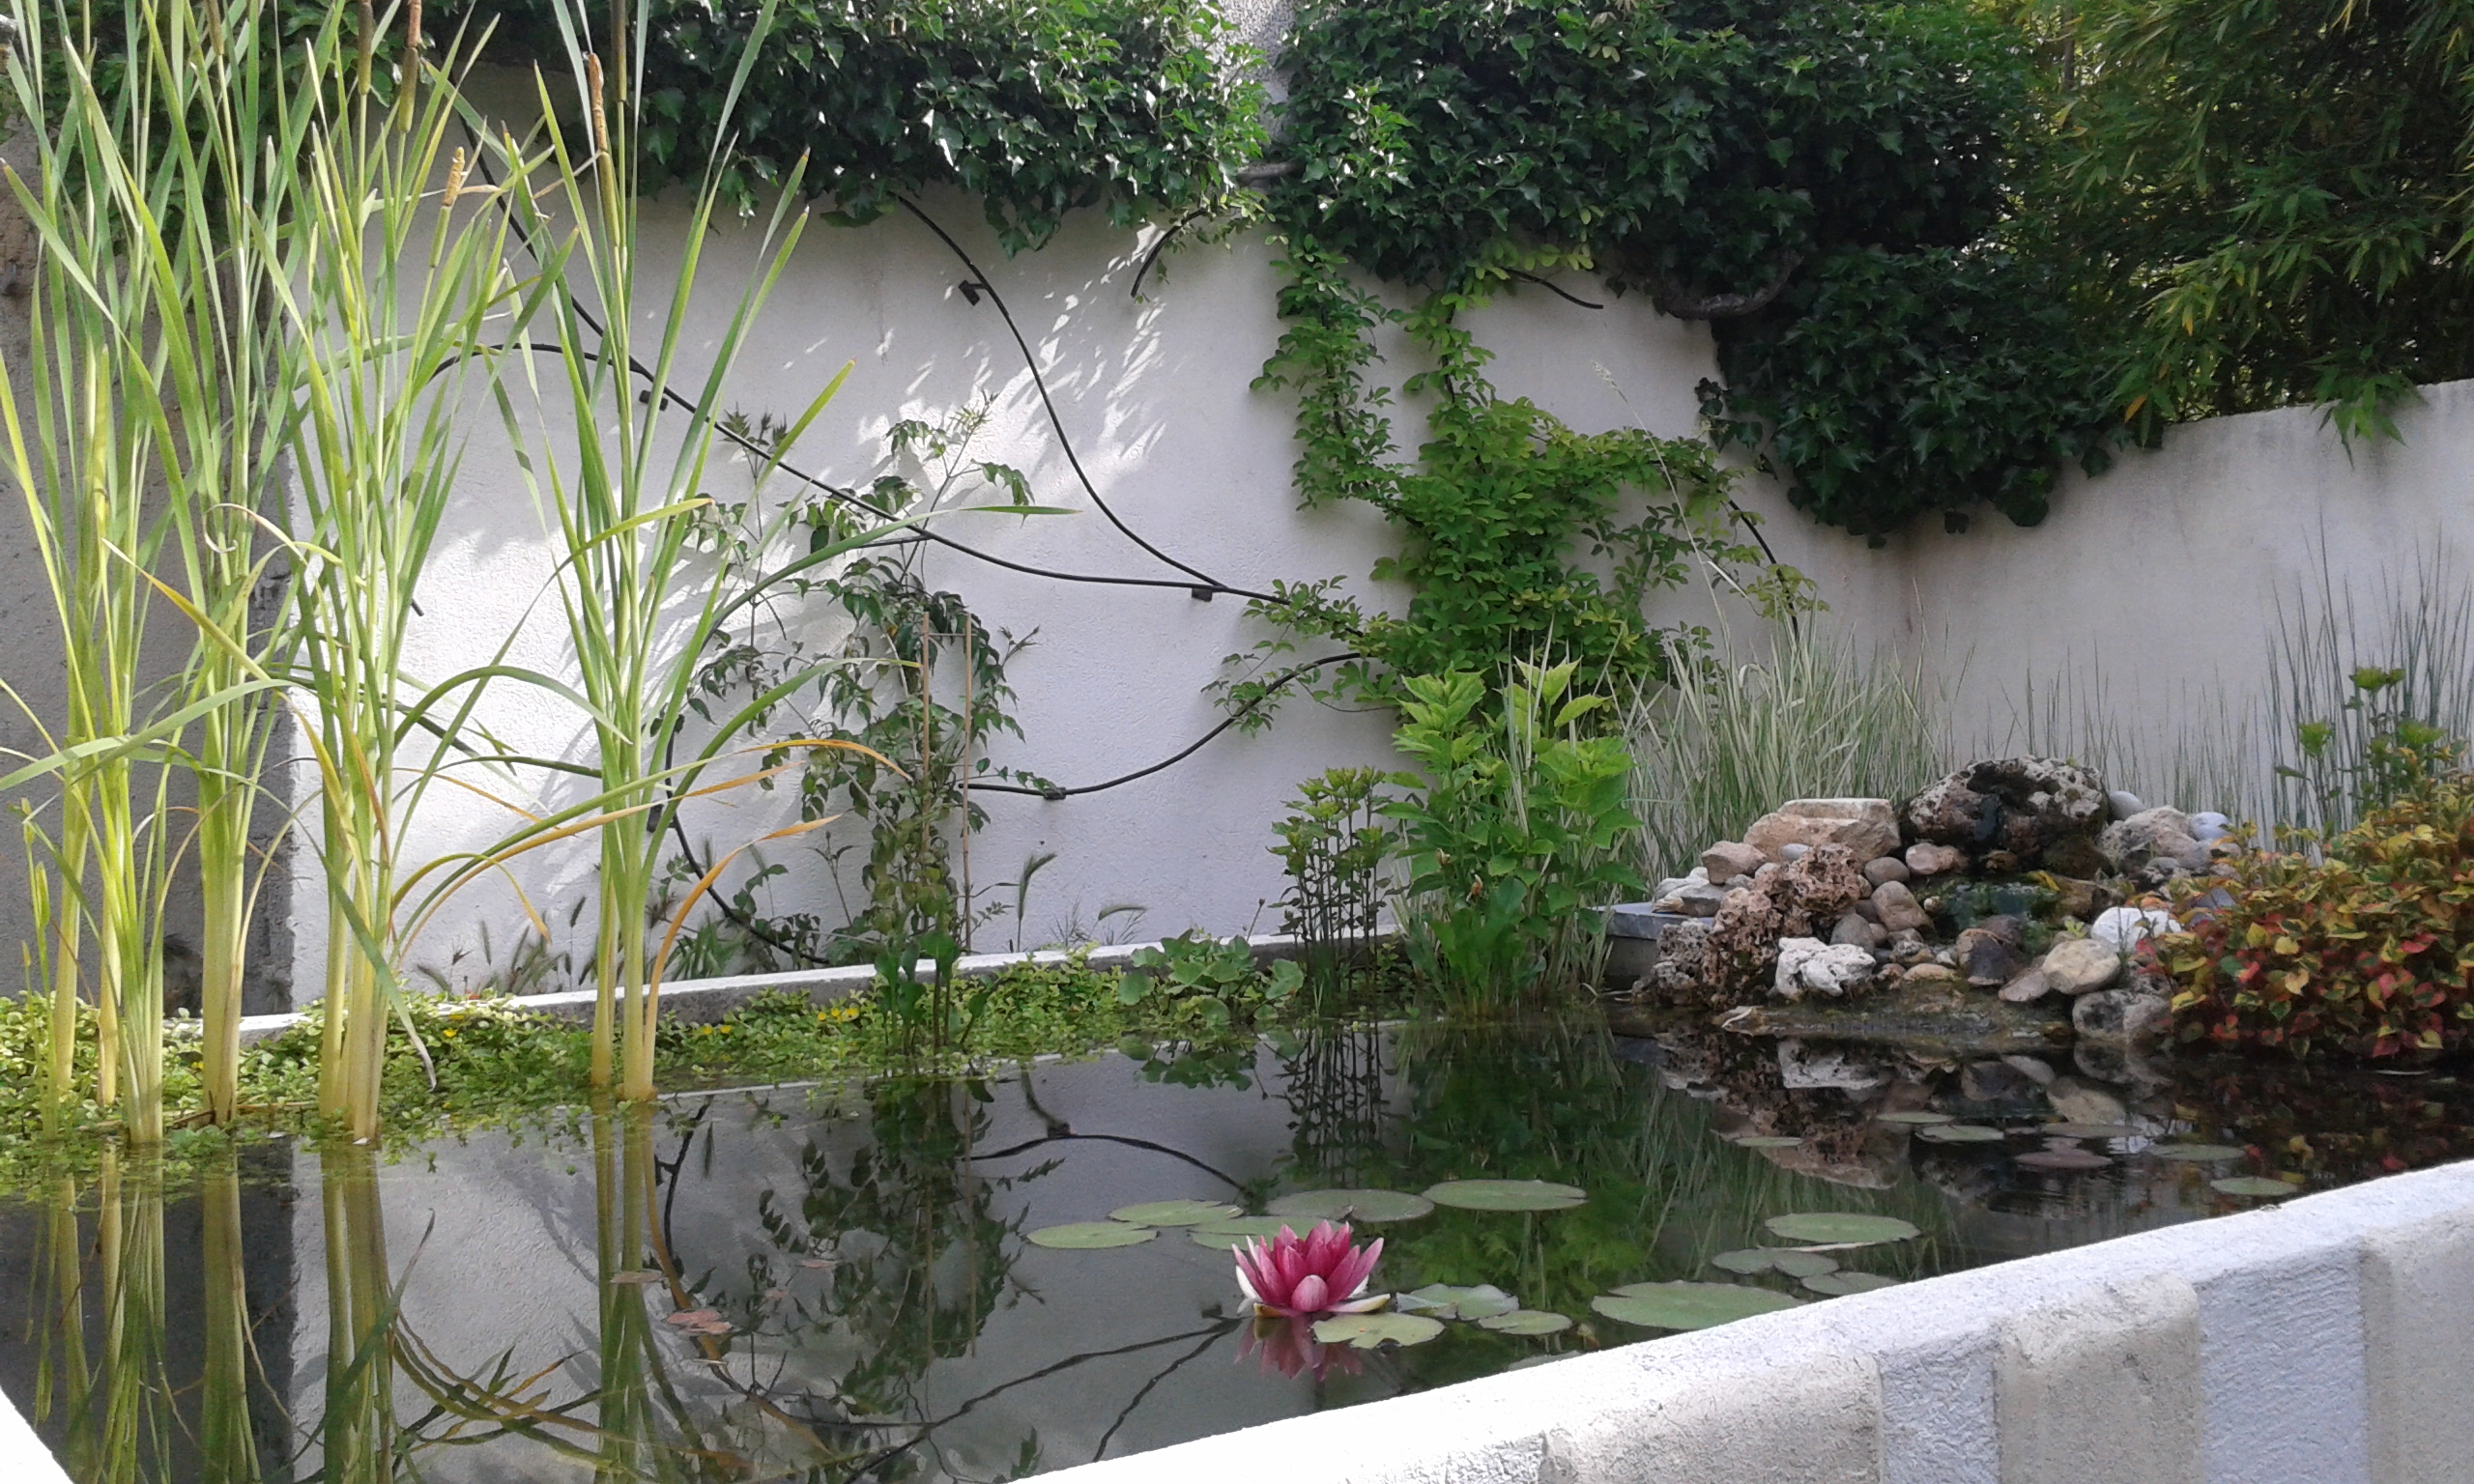 Le jardin chambres d 39 h tes de charme aix en provence - Plantes bassin de lagunage aixen provence ...